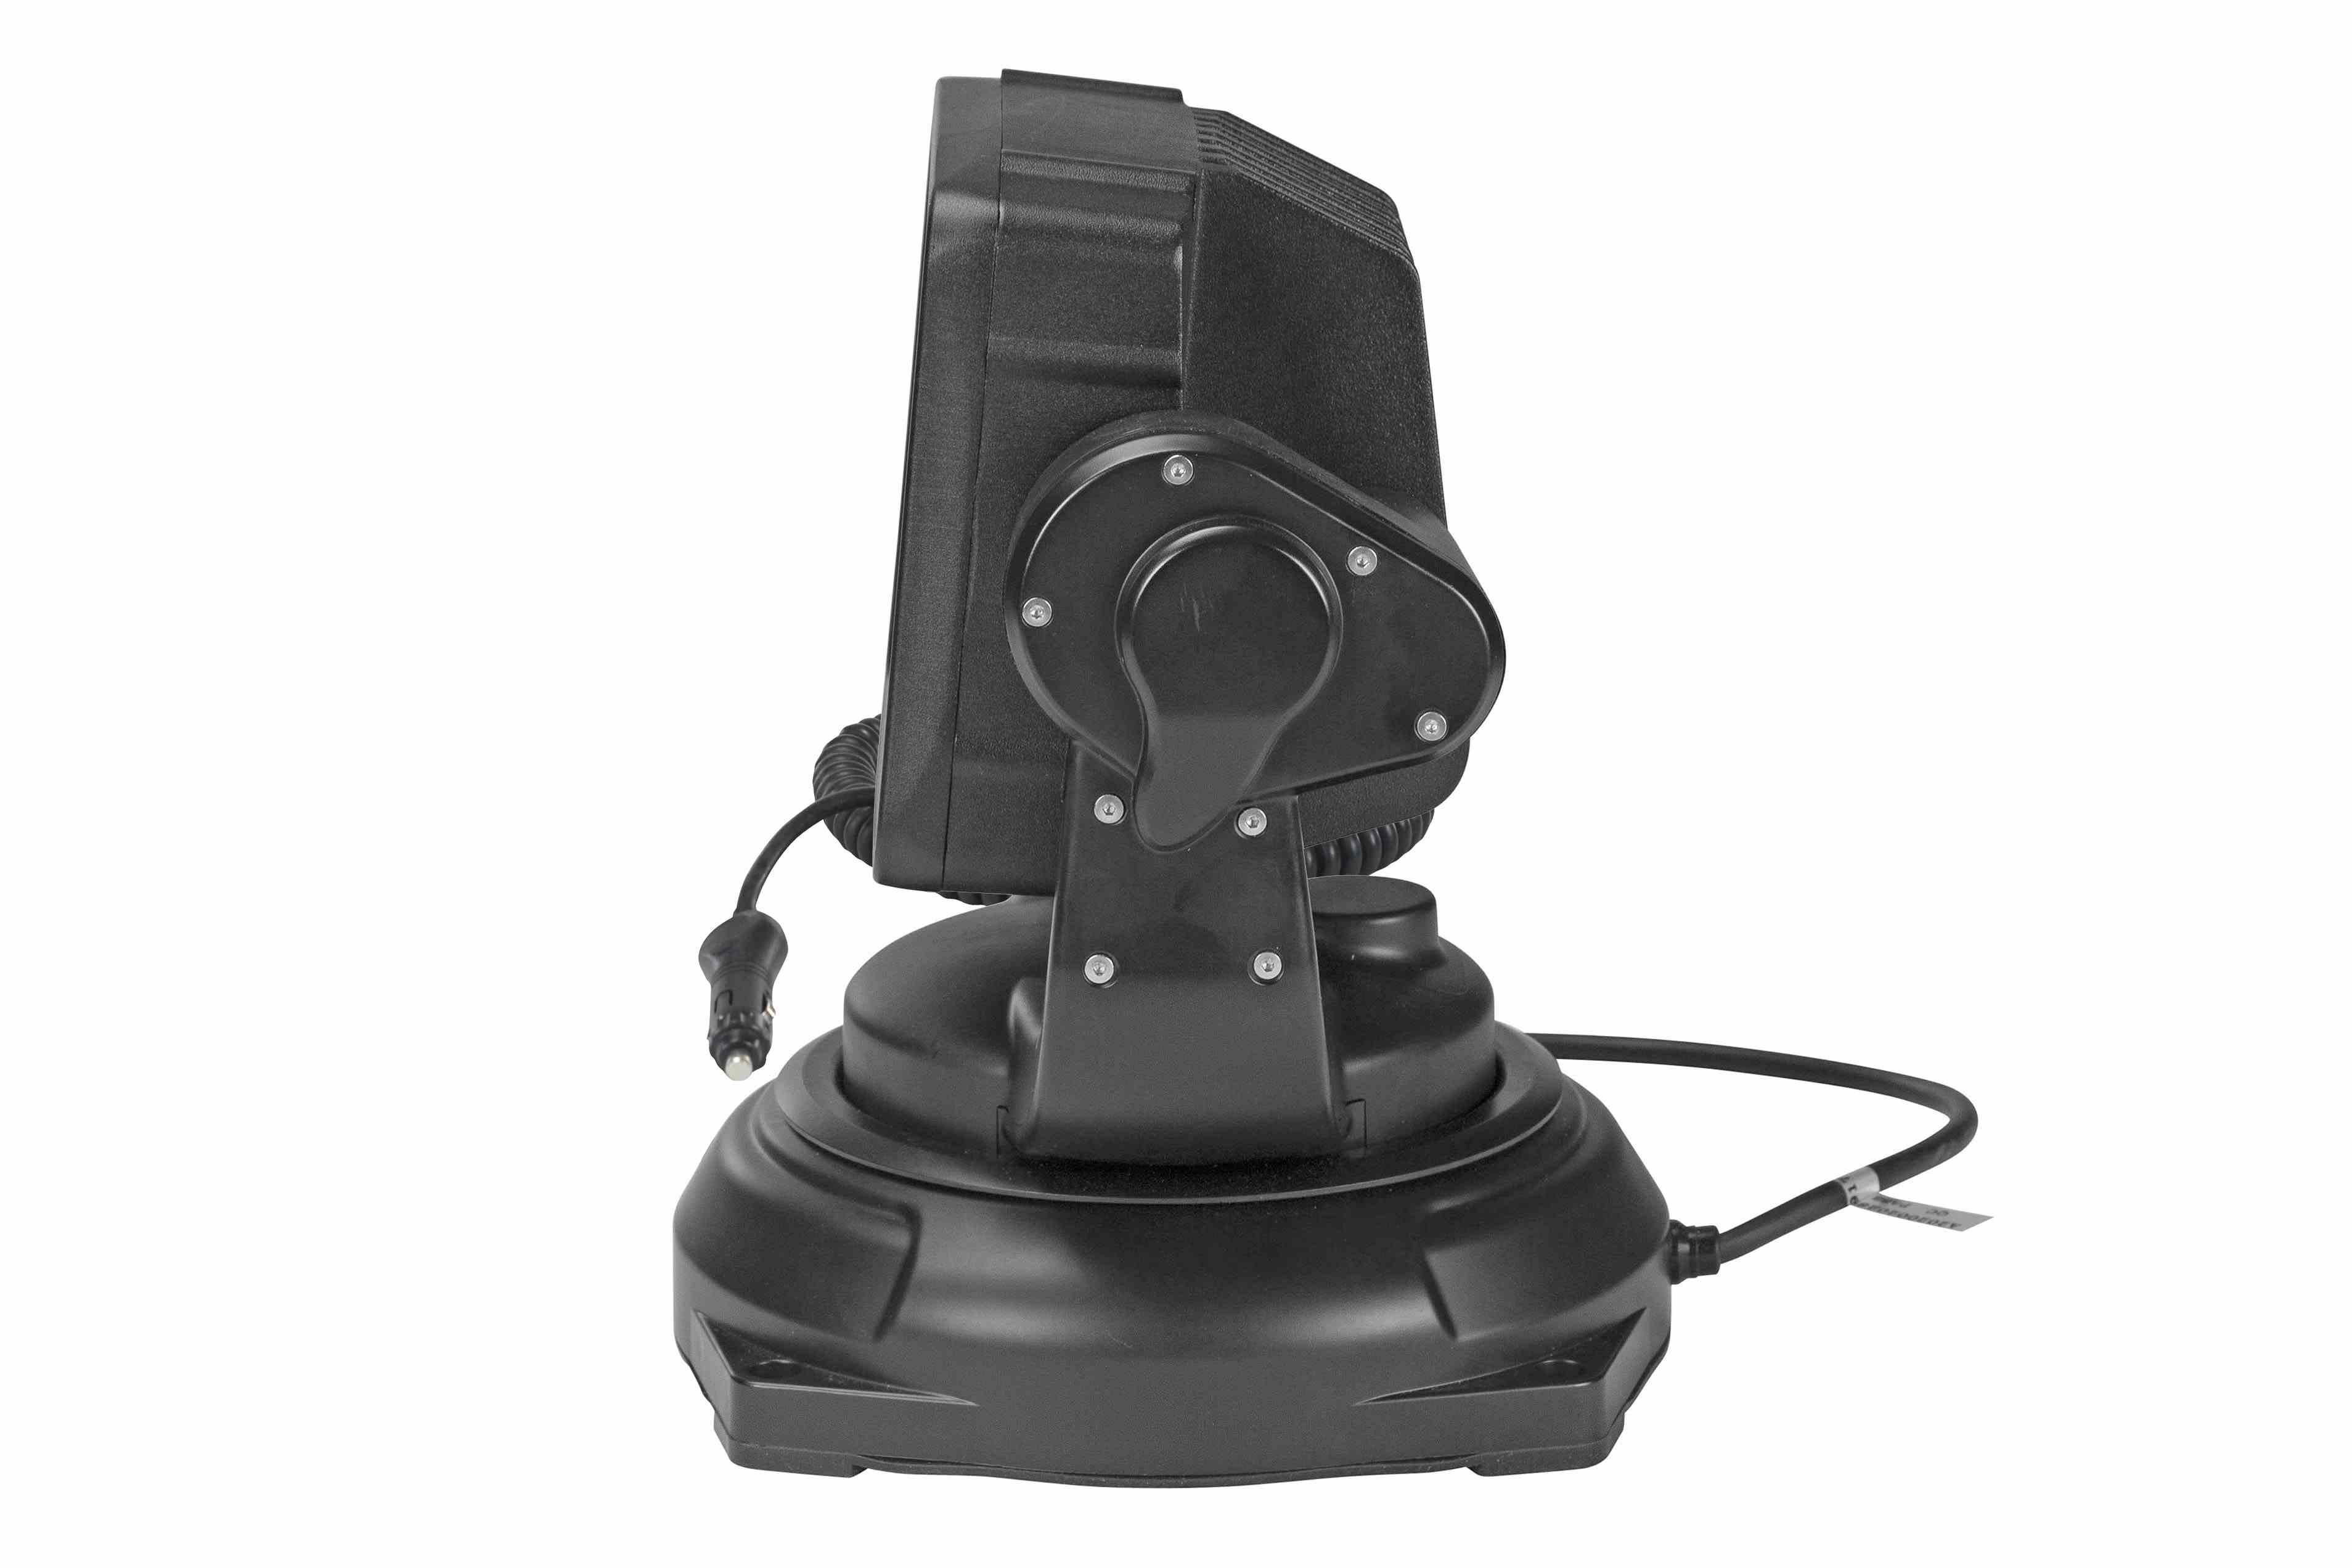 Gl 7900 Golight Radioray Portable Remote Control Spotlight Spot Light Wiring Diagram Hi Res Image 4